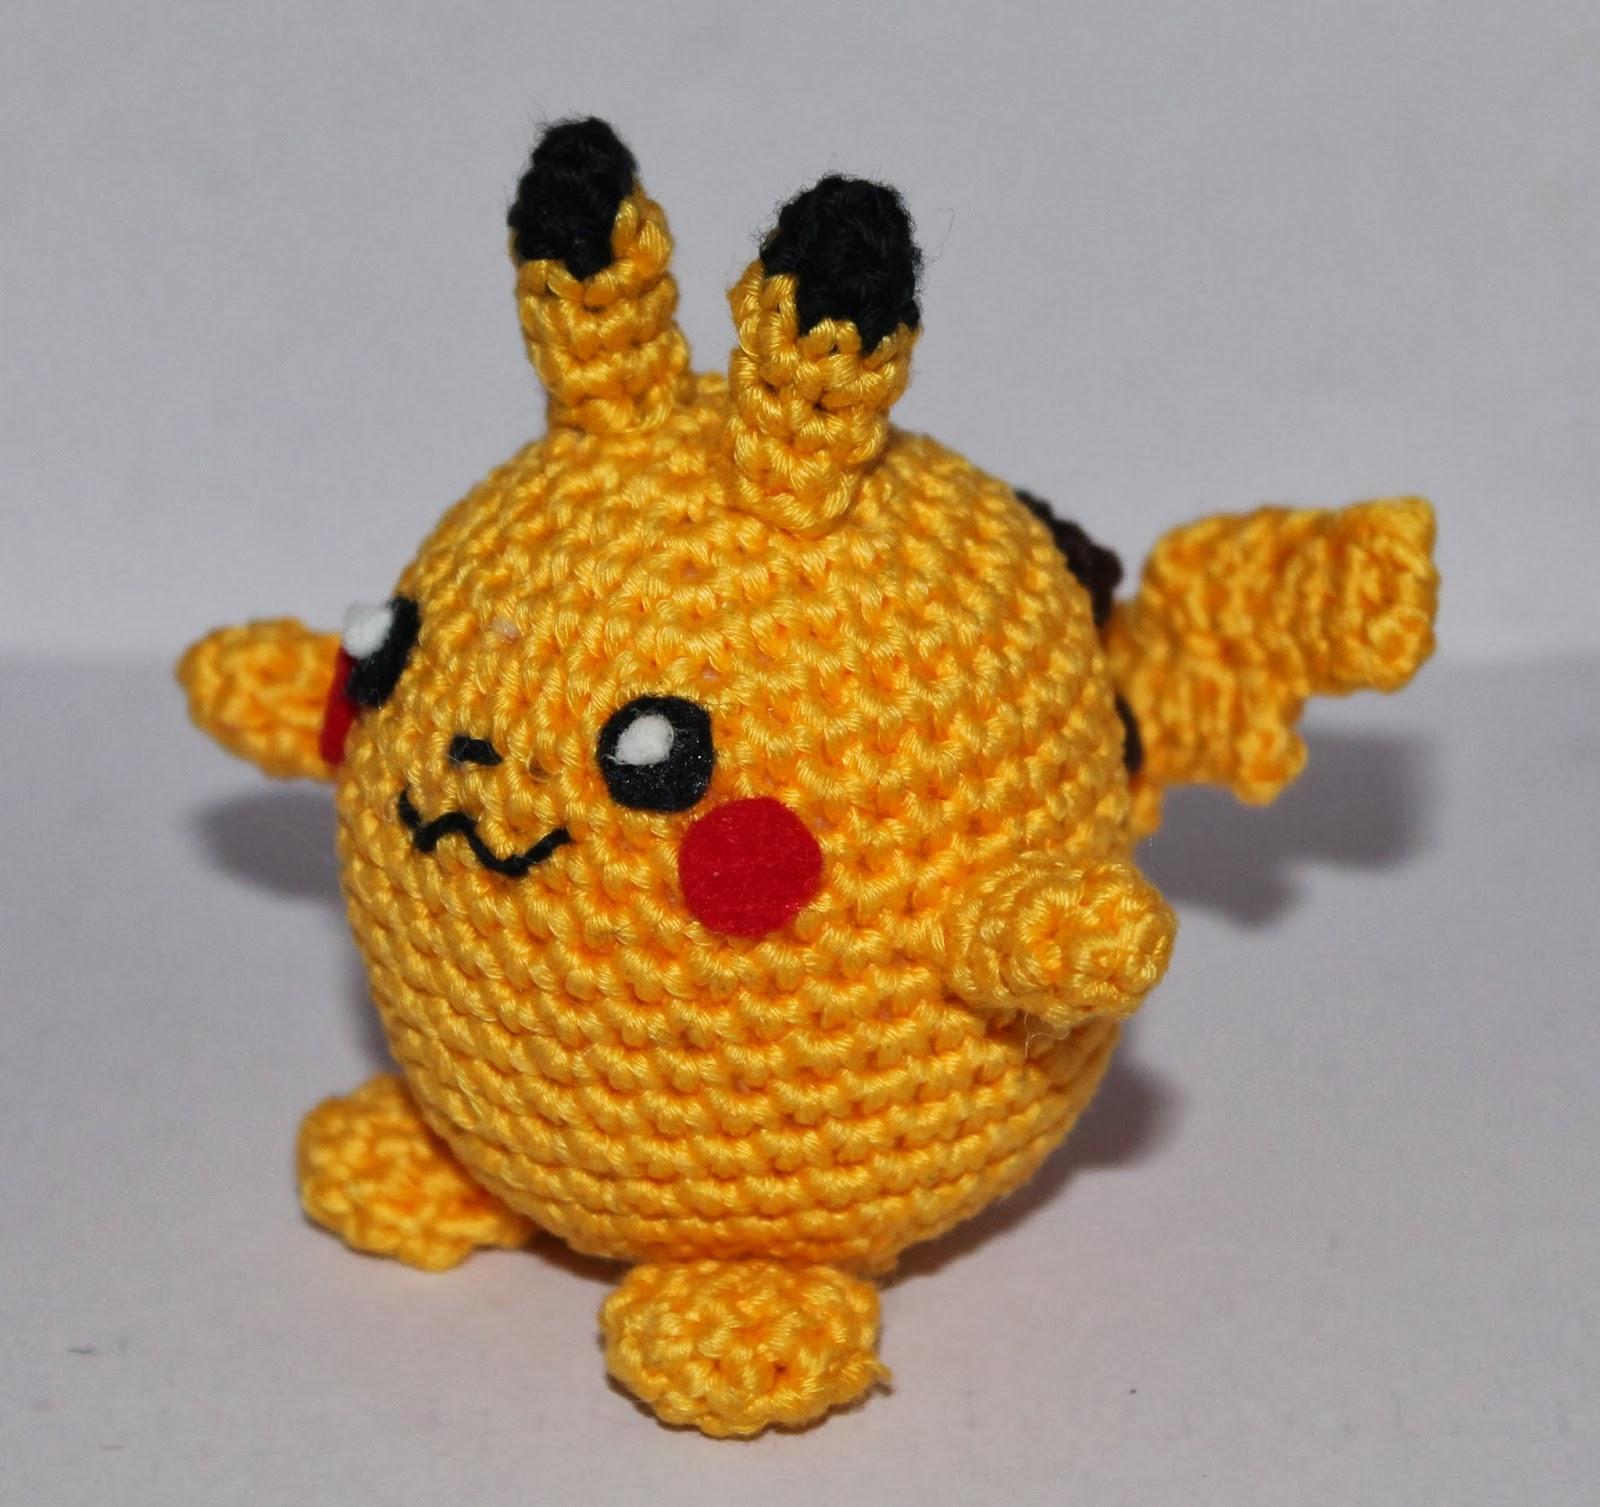 Doni handmade: Chubby pikachu pattern